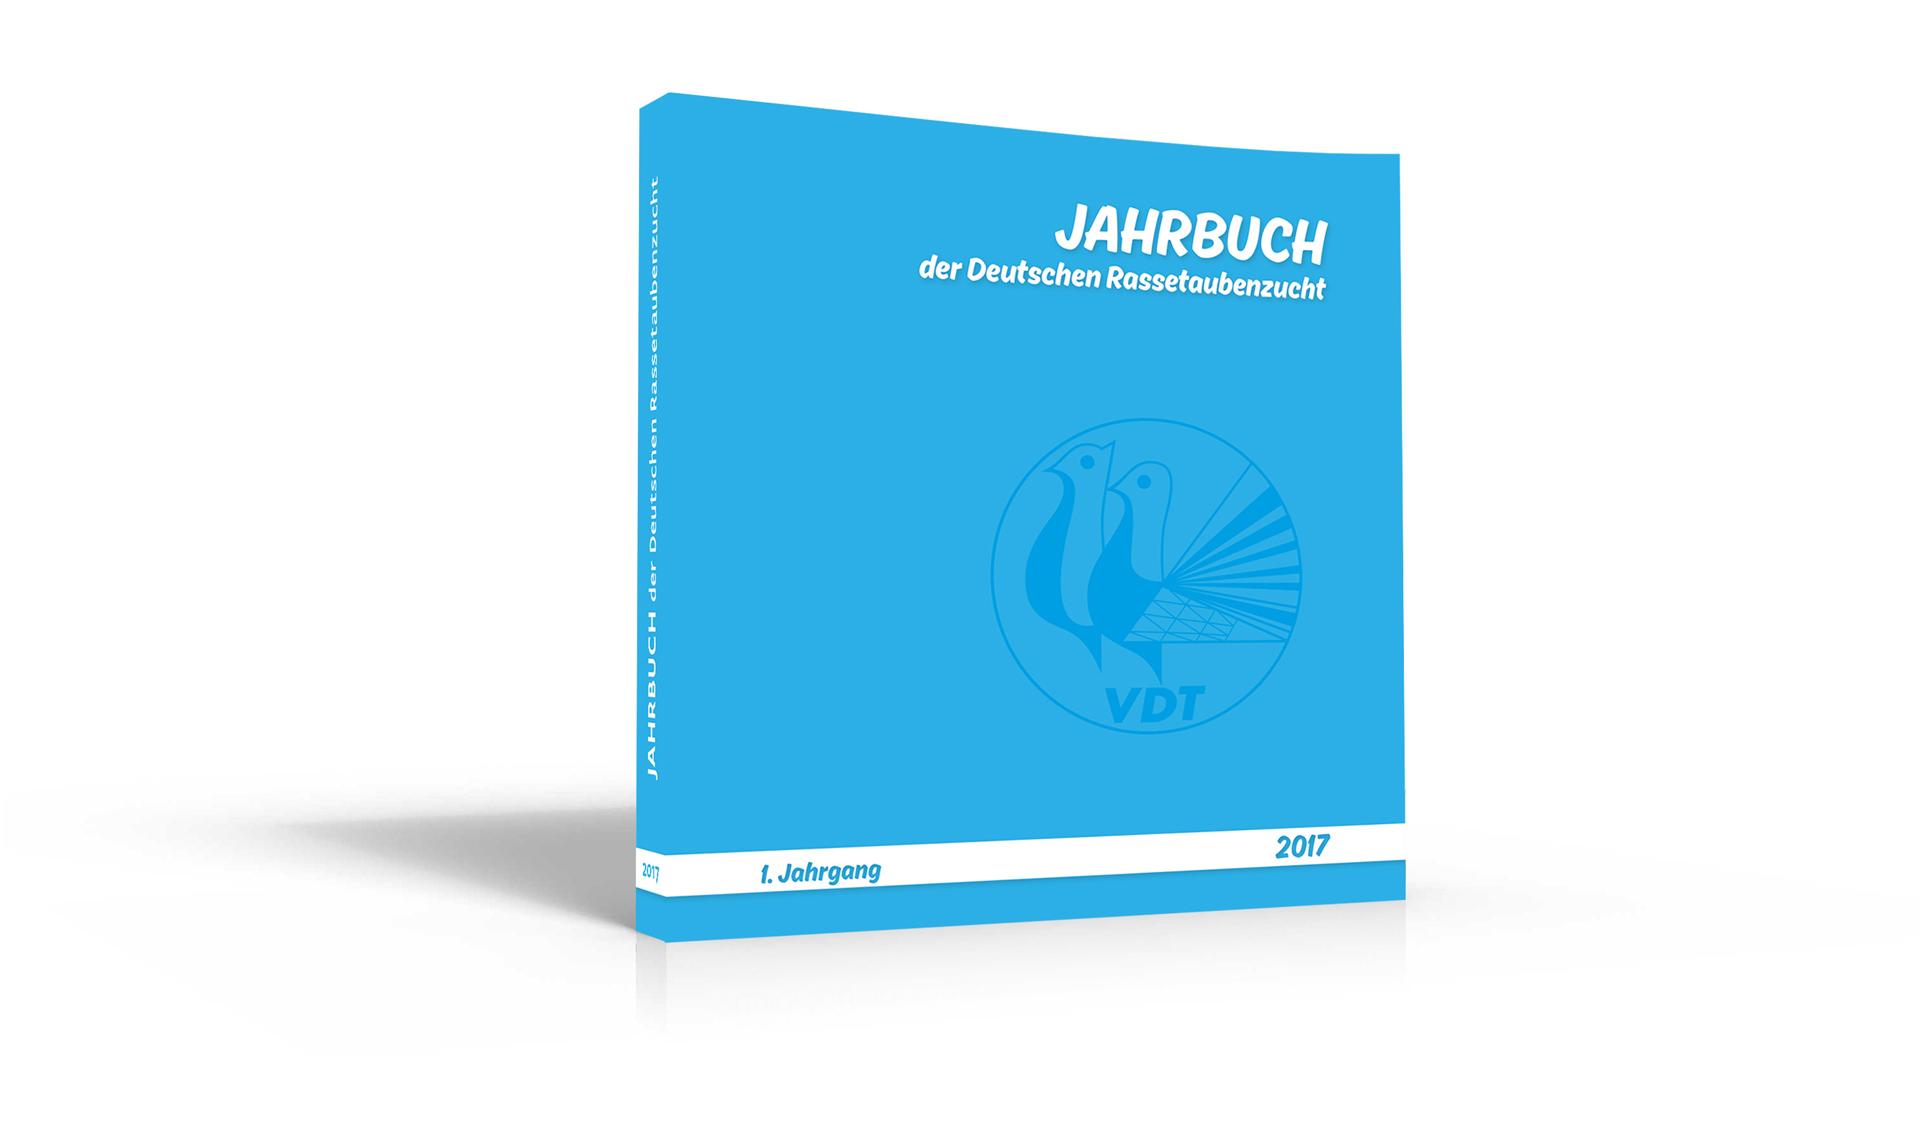 VDT-Jahrbuch-2017-Jahrgang-1